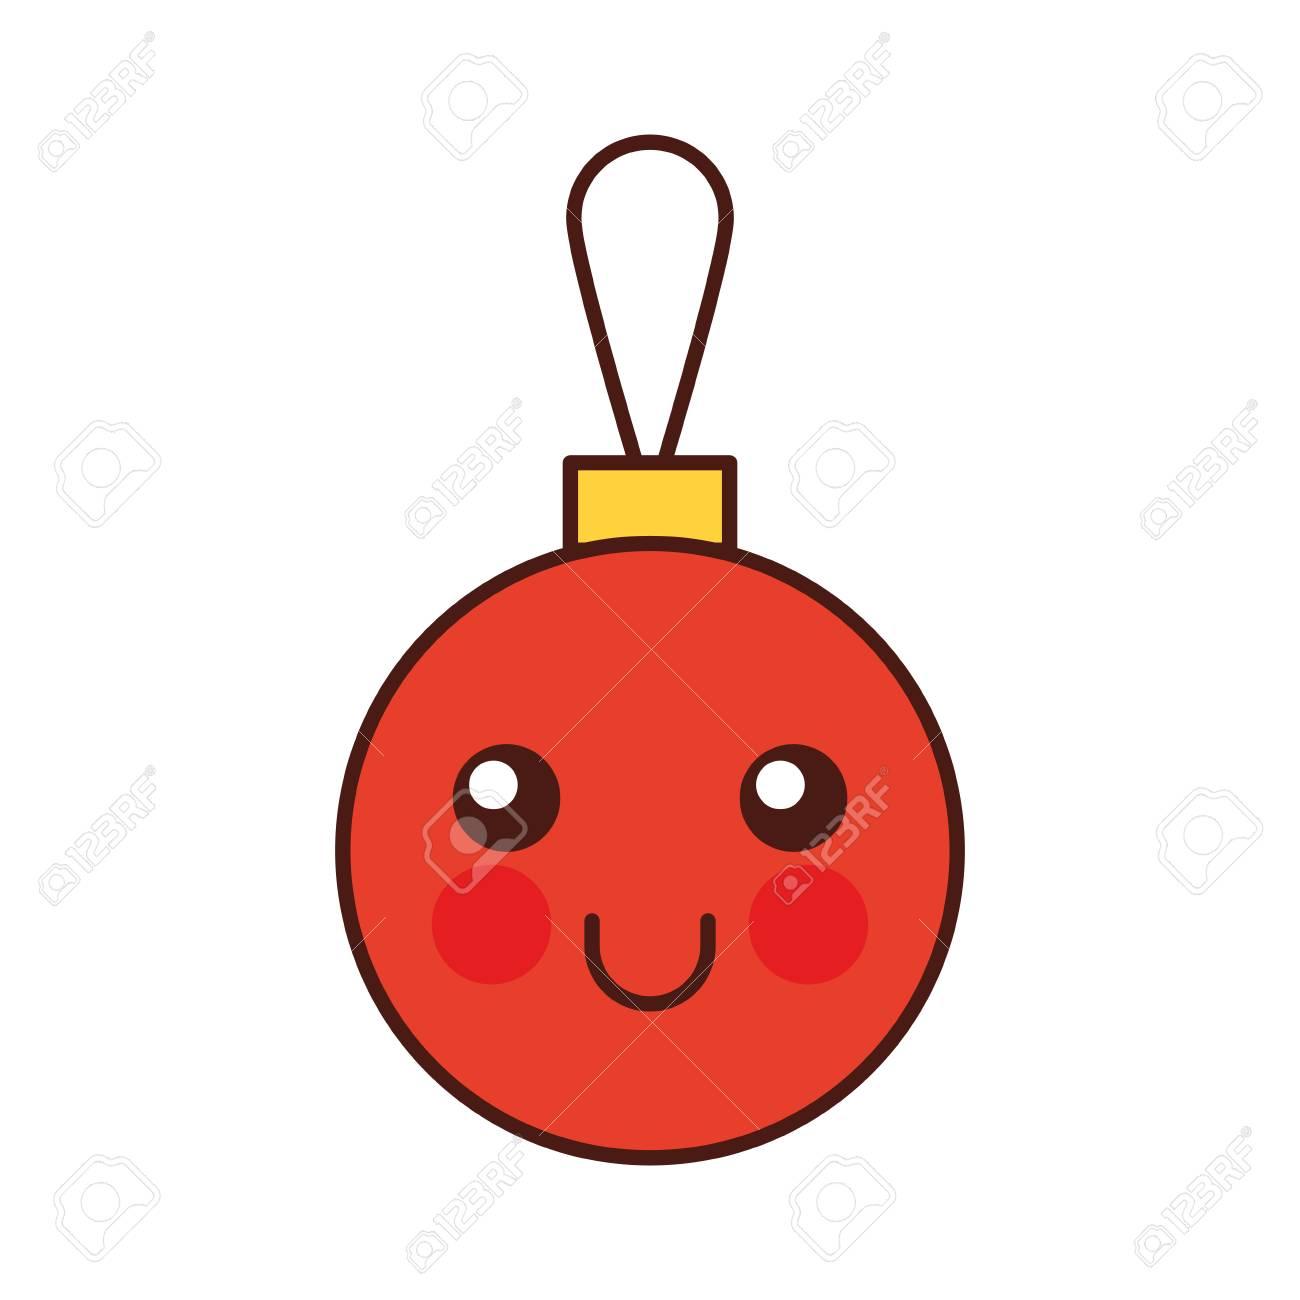 Kawaii Christmas Ball Decoration Cartoon Vector Illustration Royalty ...